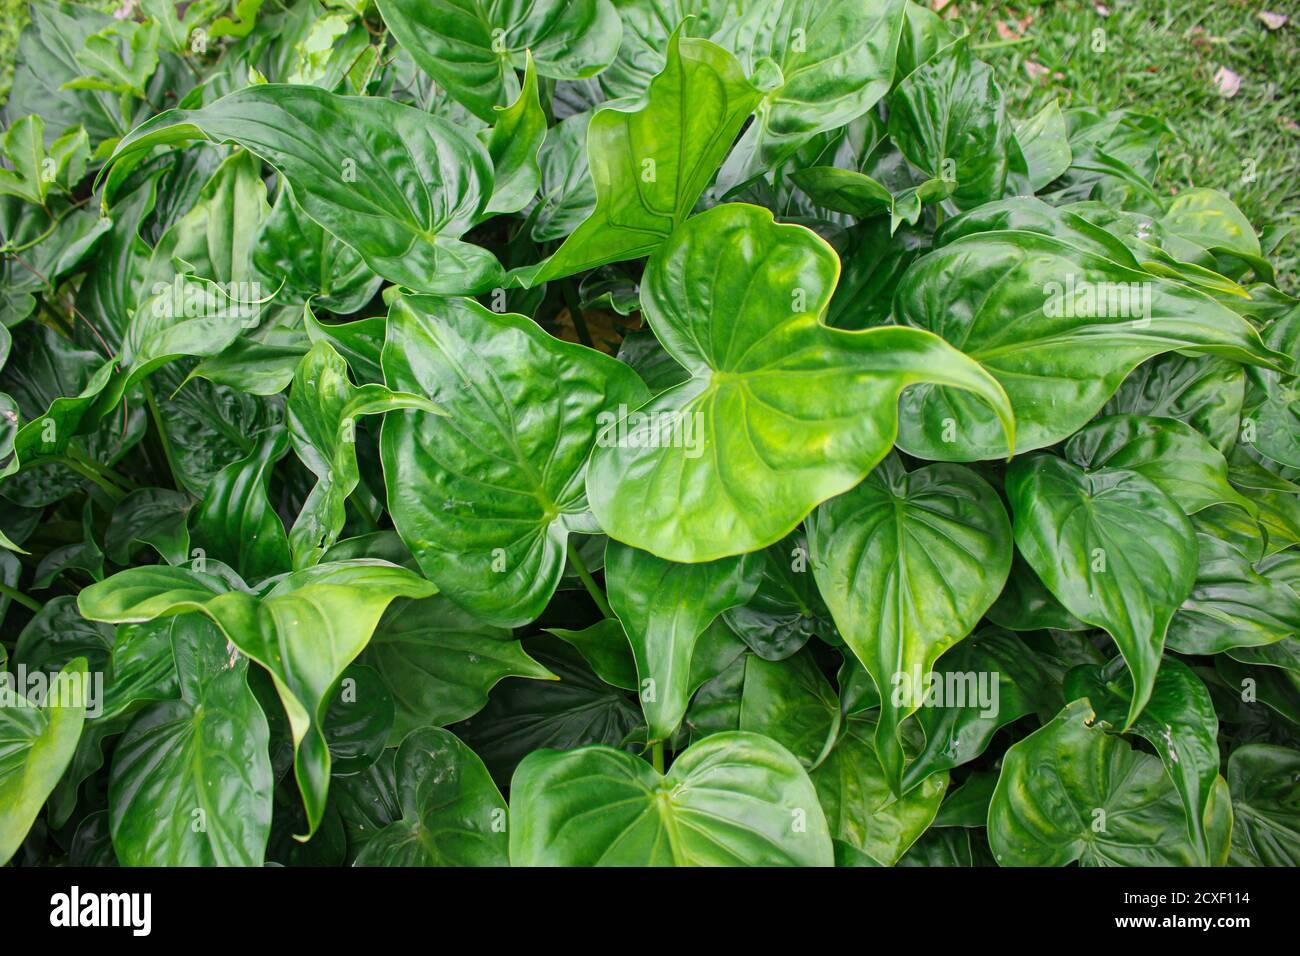 Foglie verdi tropicali, foglie tessitura asia natura immagine Foto Stock